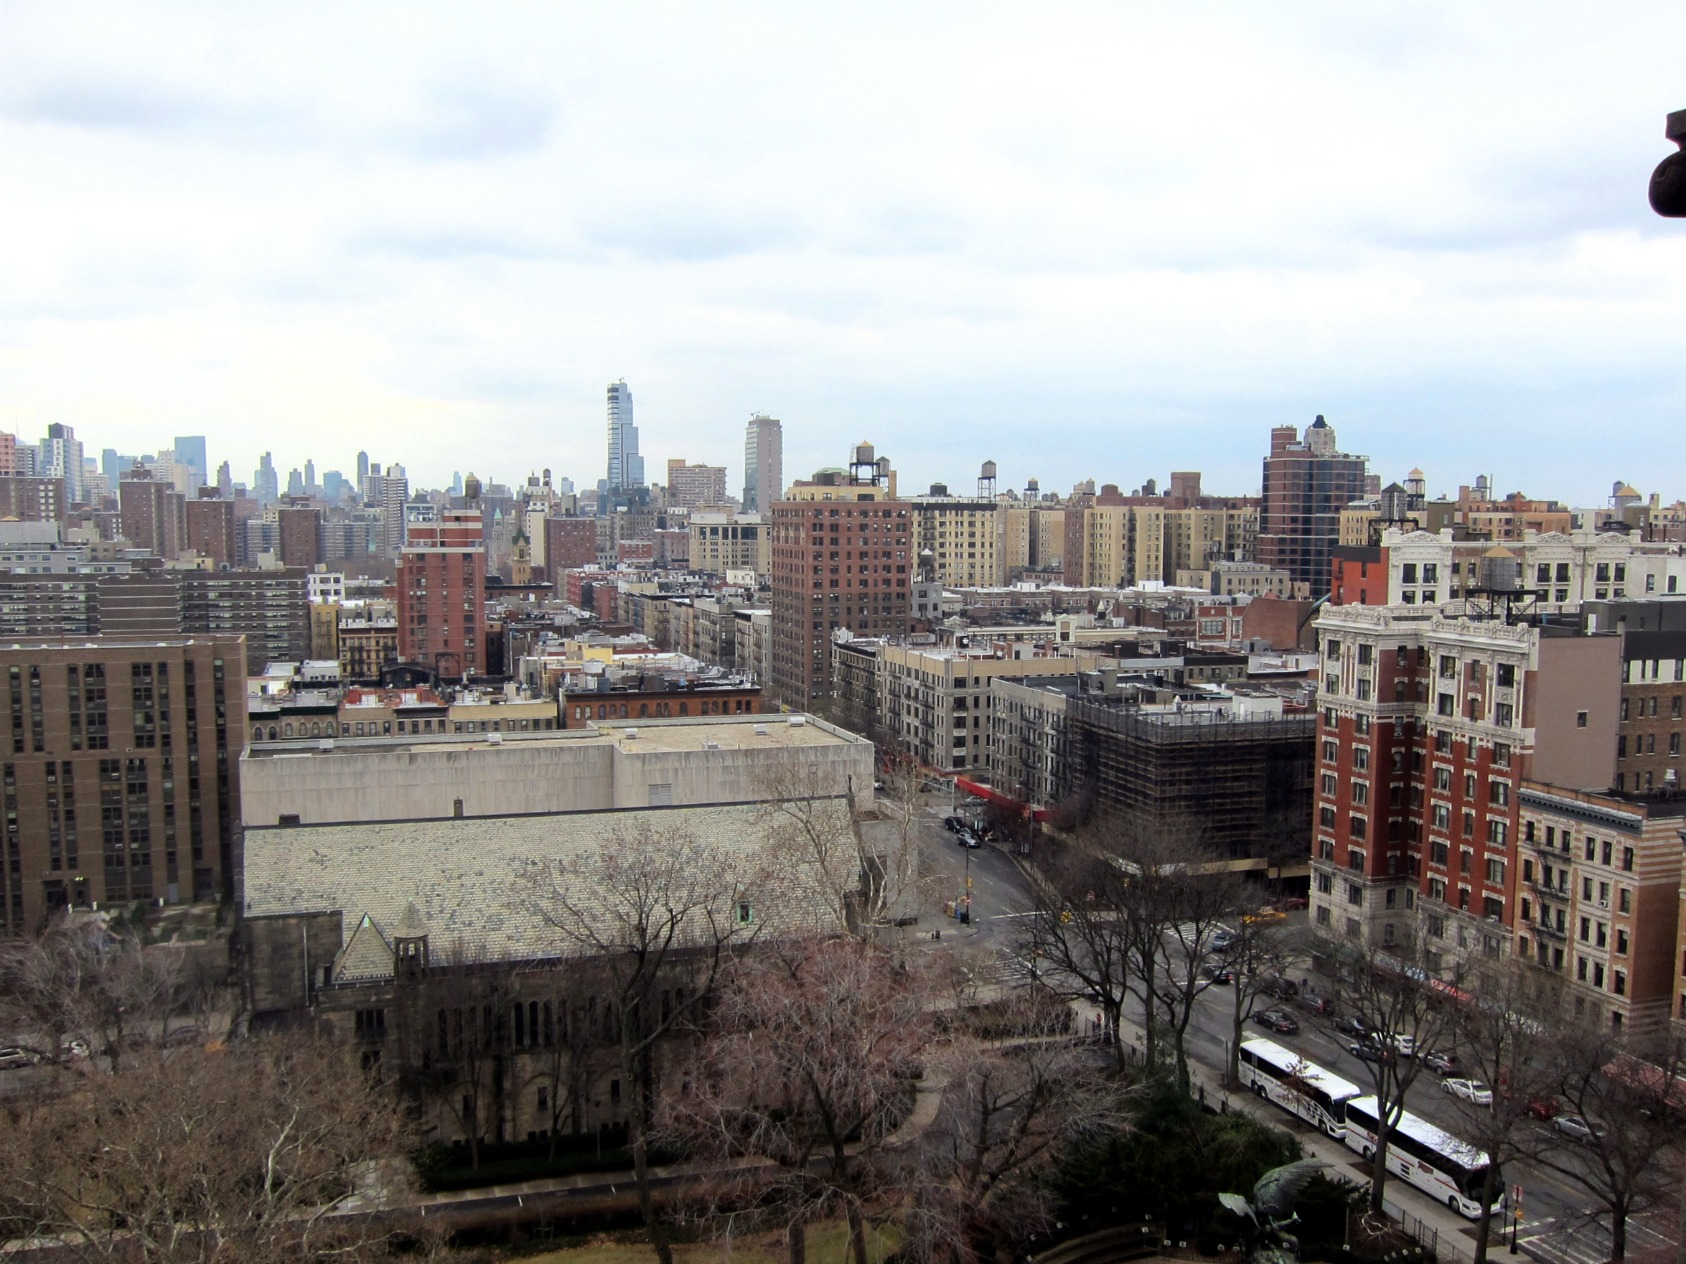 Nyc-rental-apartments-tips-tricks-tentant-screening-report